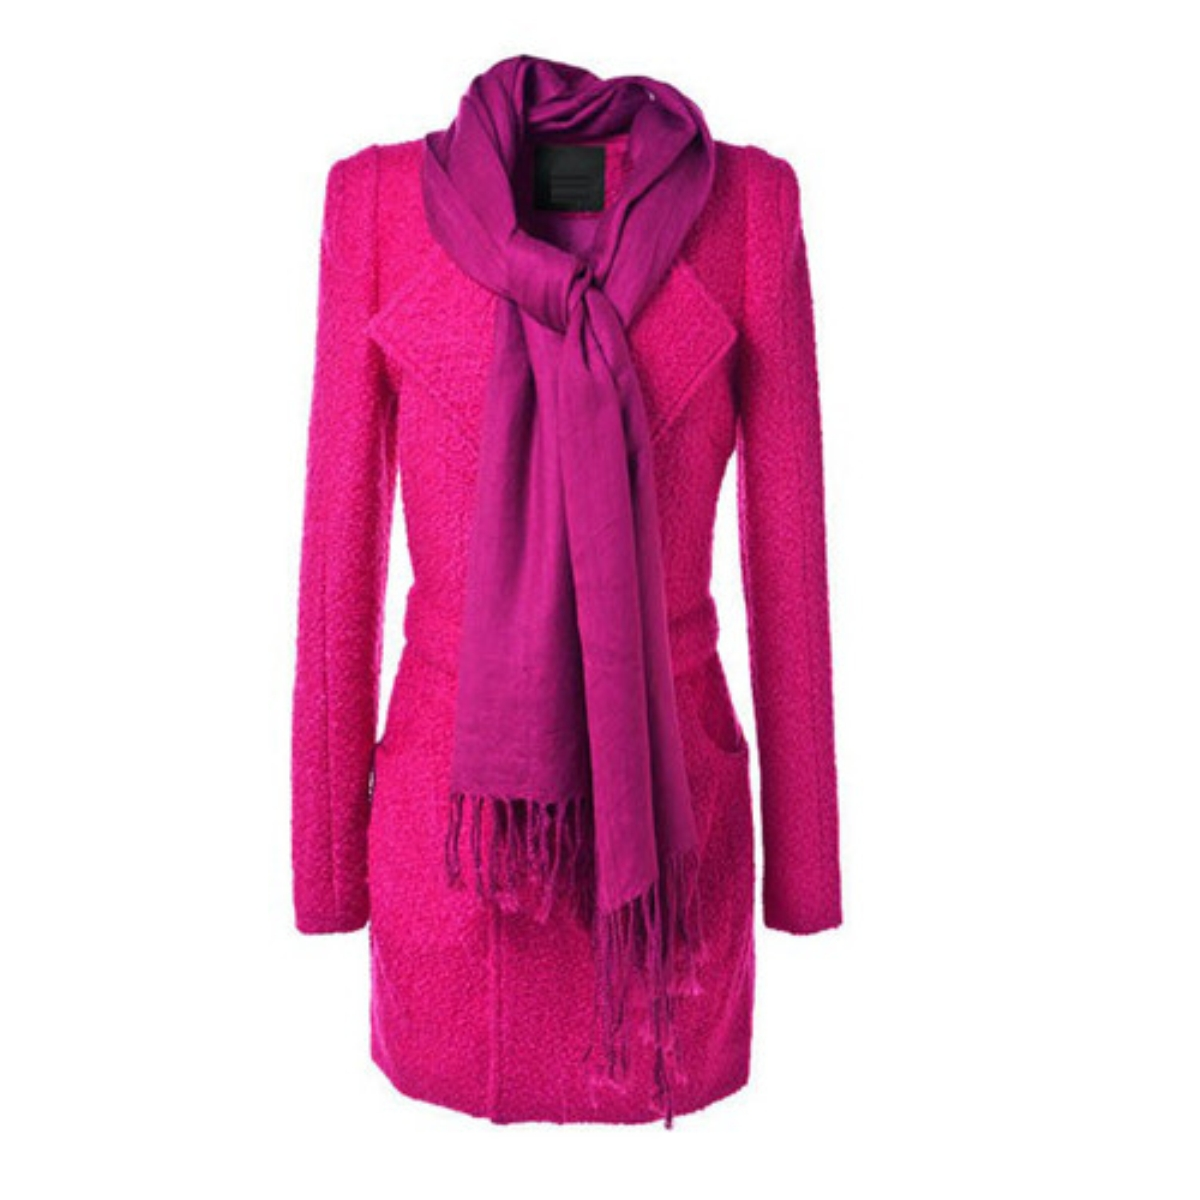 Plain Lapel Long Sleeve Woolen Coat,Cheap in Wendybox.com